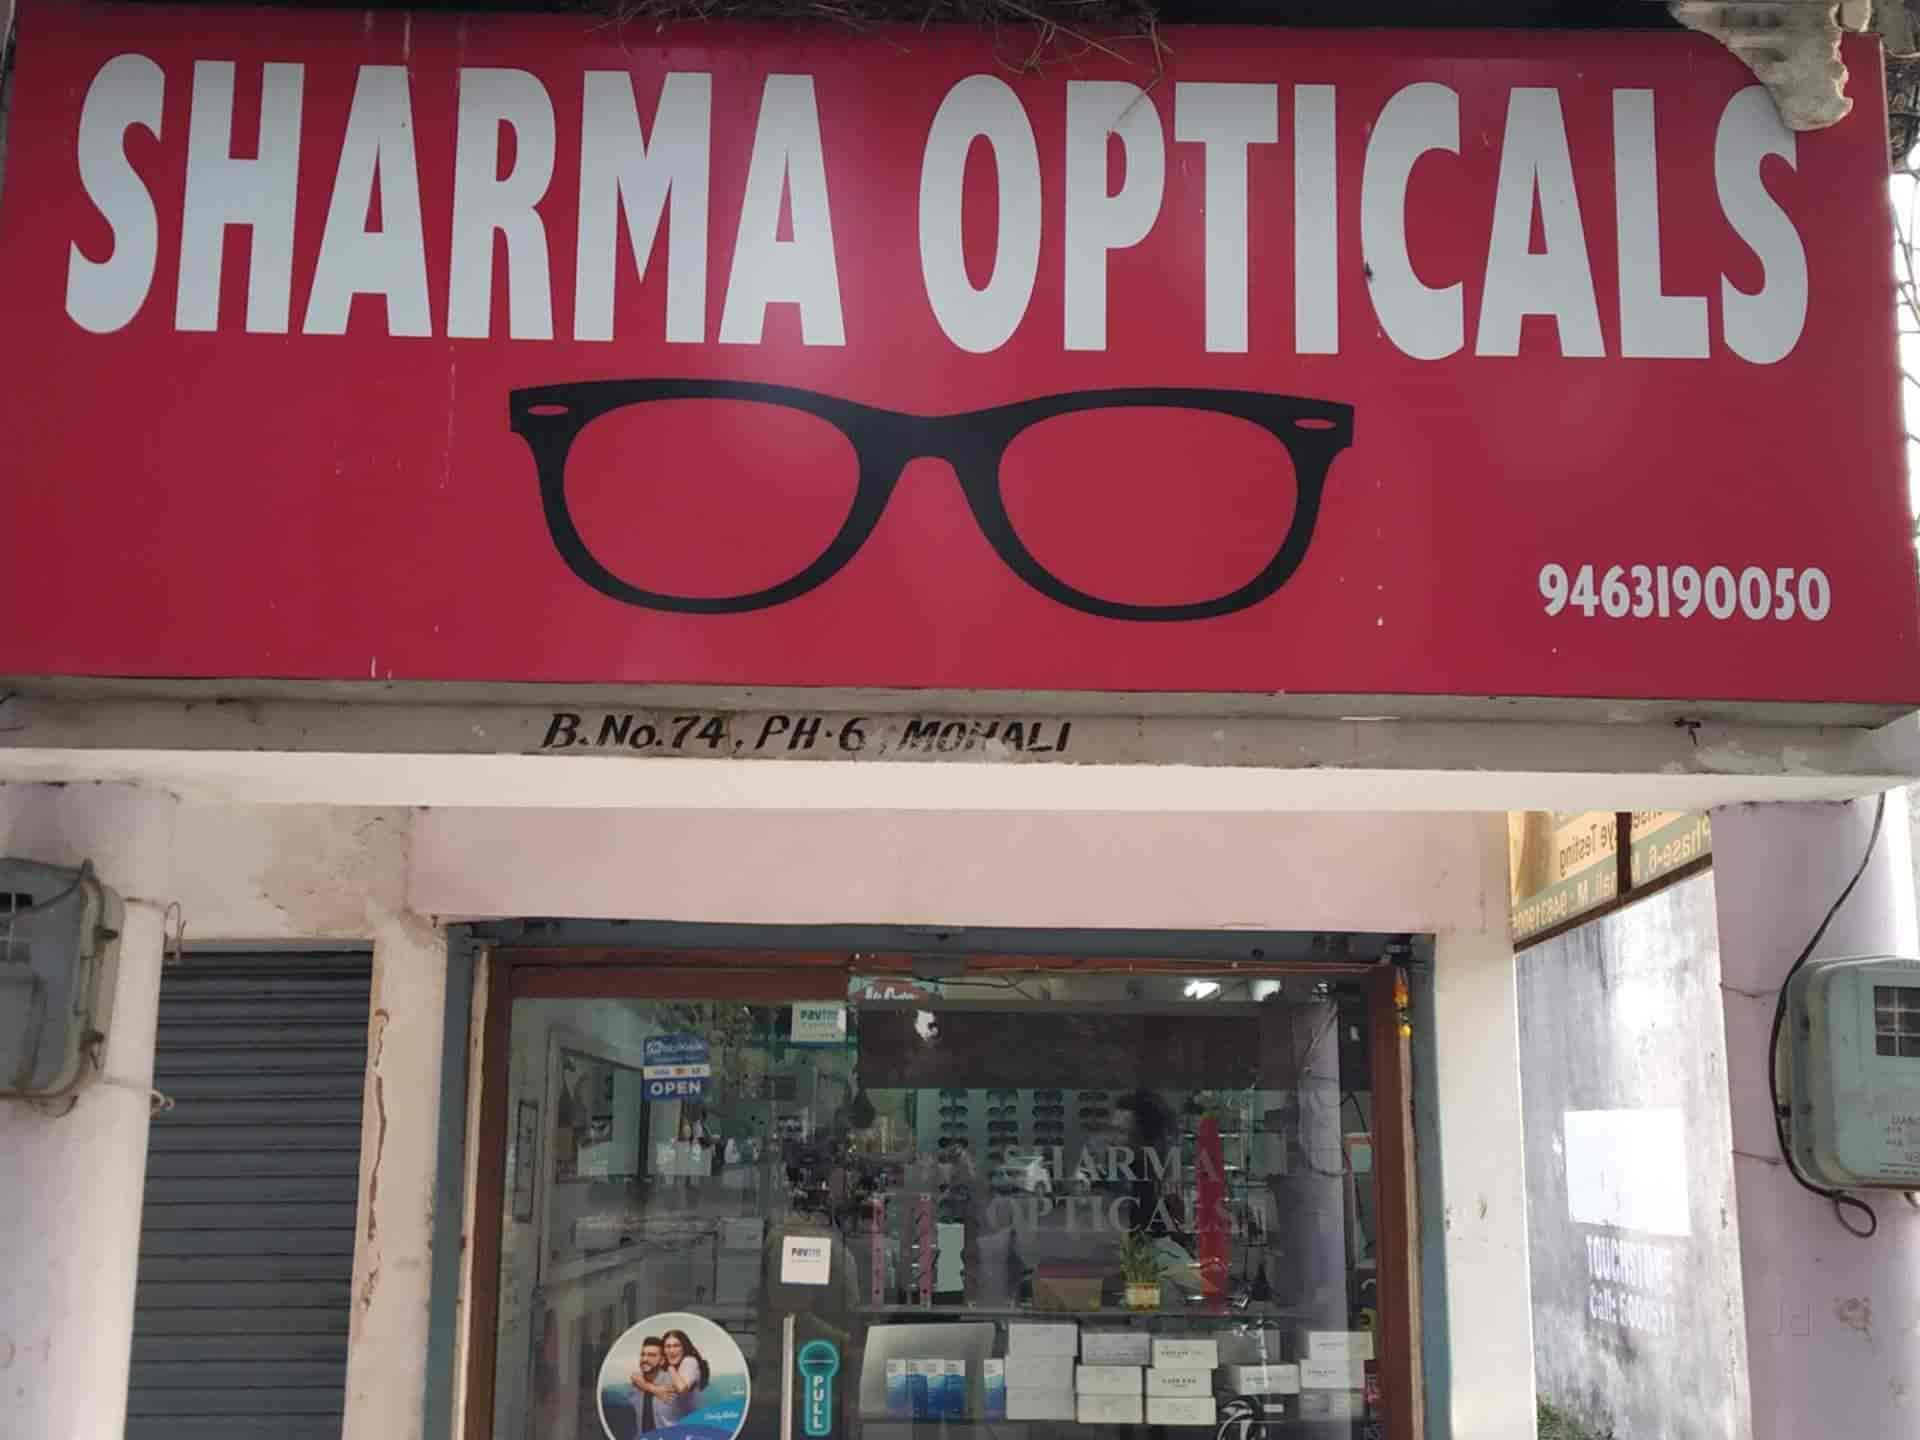 46abfa1715 Sharma Opticals Photos